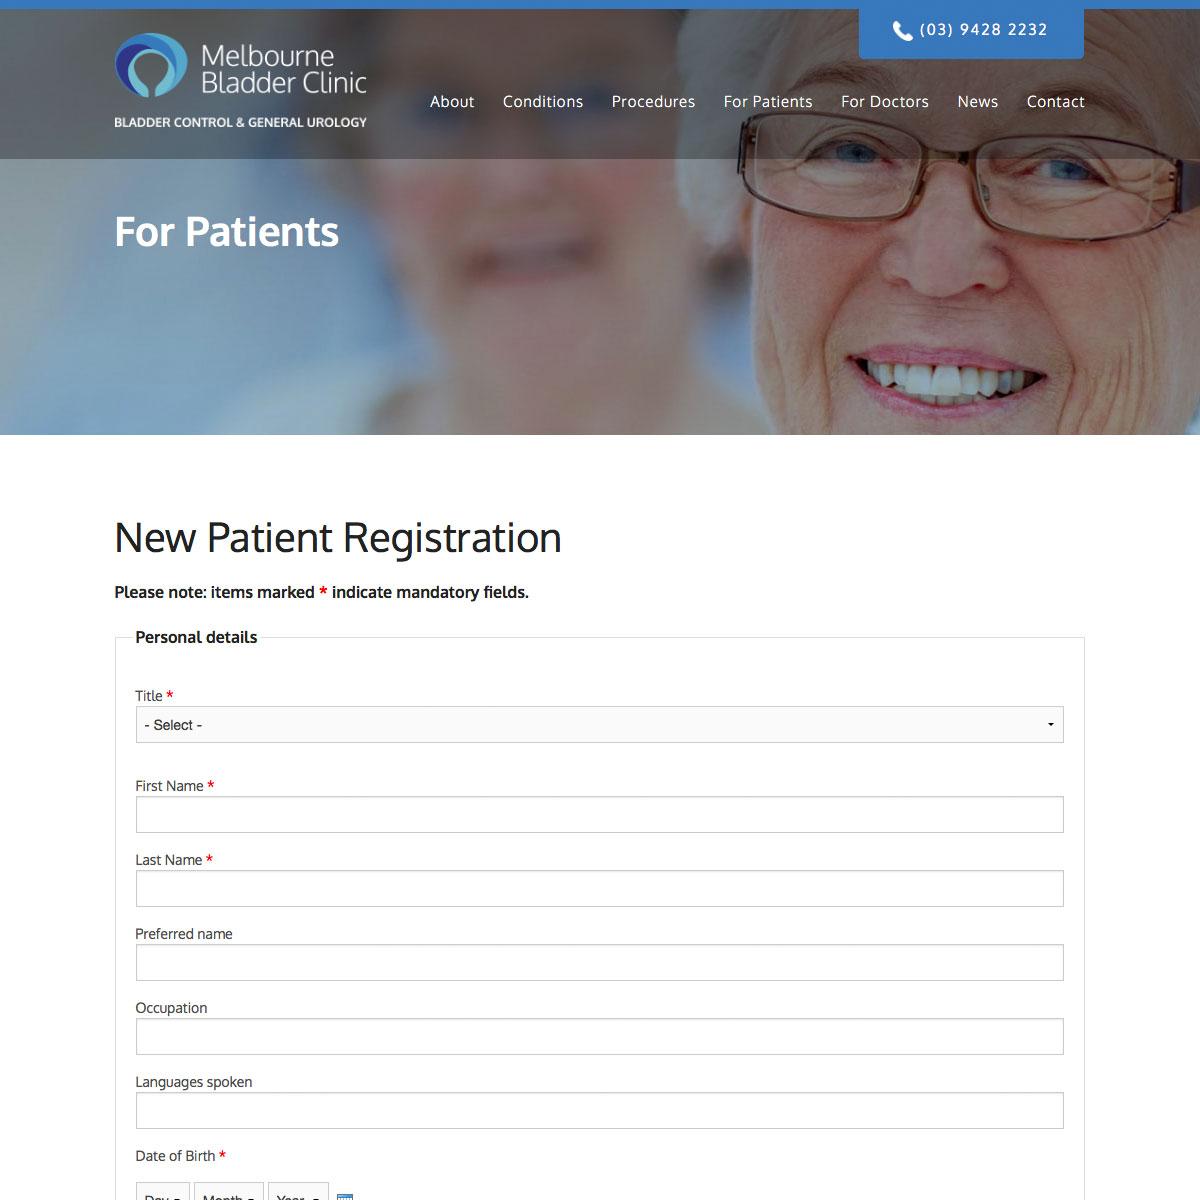 Melbourne Bladder Clinic New Patient Registration